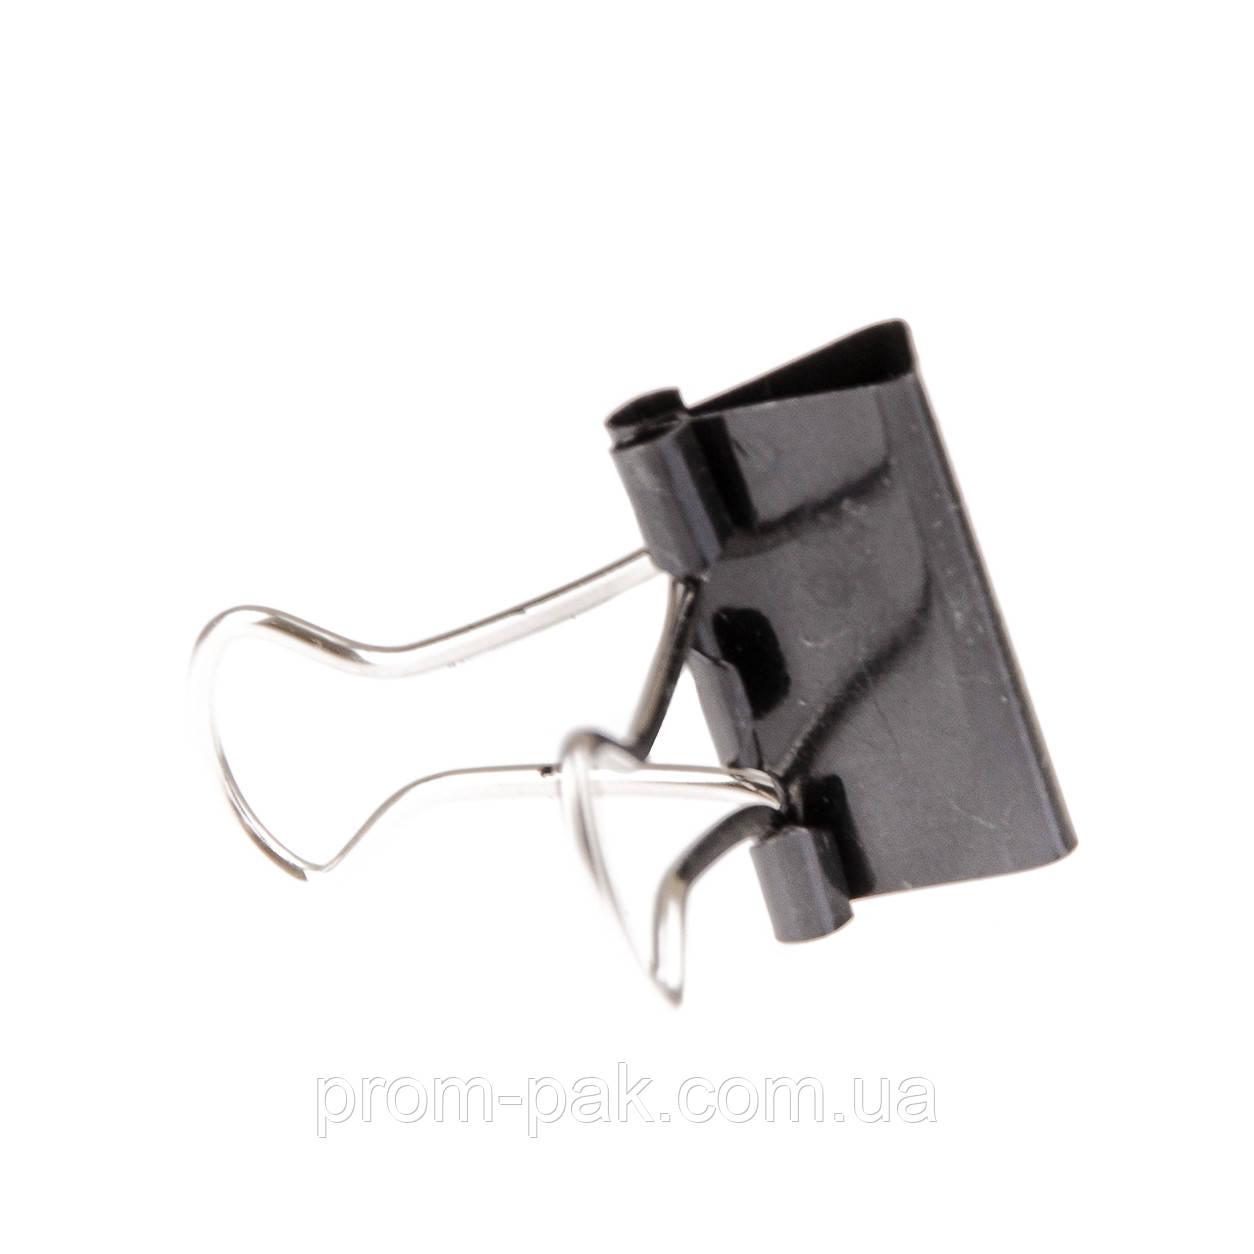 Биндеры для бумаги 15 мм